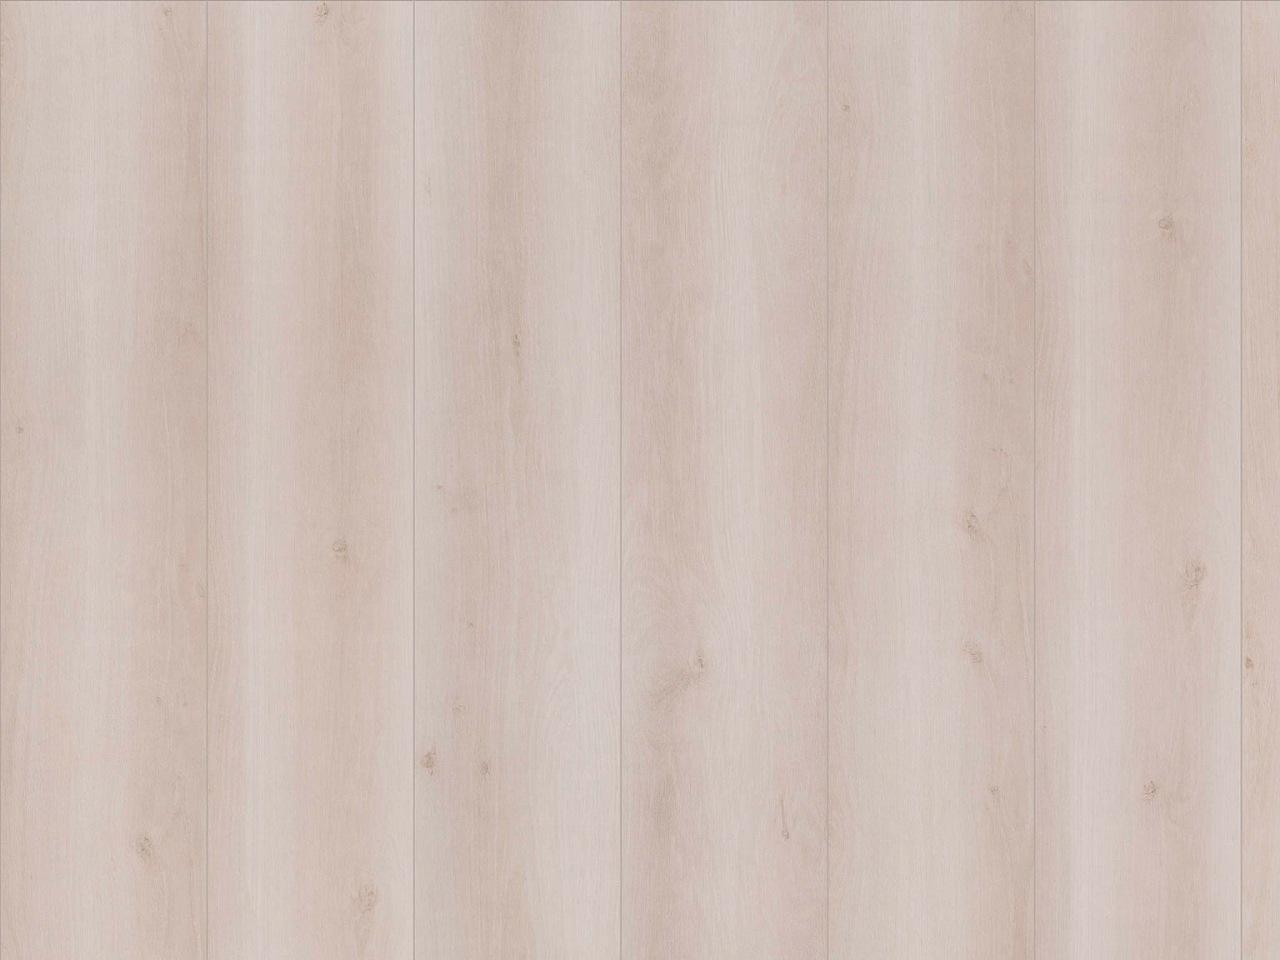 Laminatboden Oak Gallery Format L – Calm Oak white, LV4164